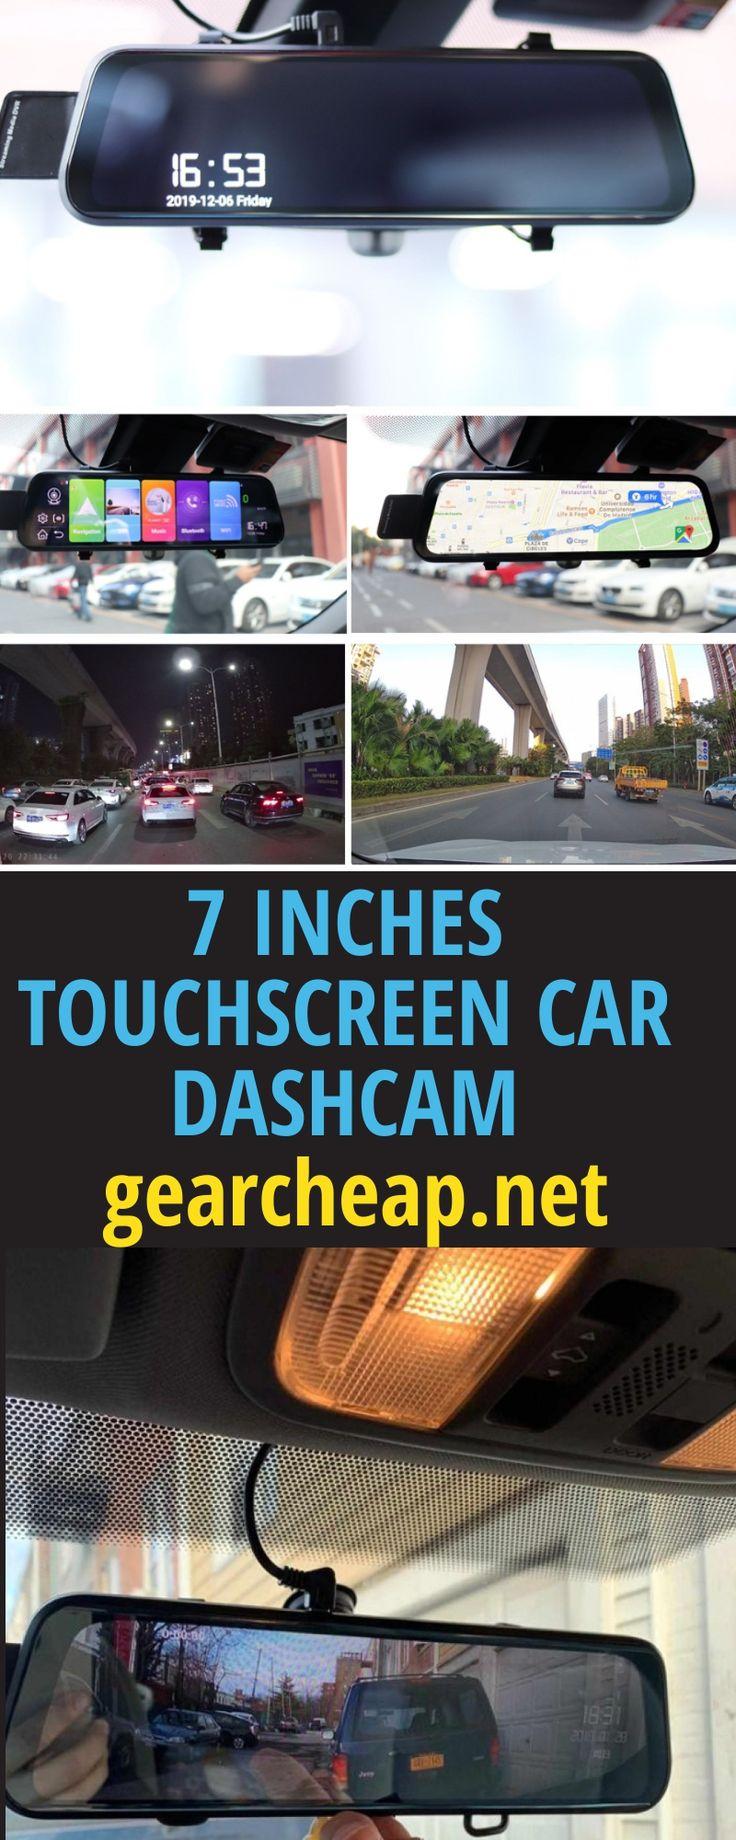 7 inches touchscreen dashcam car dvr dual lens rearview